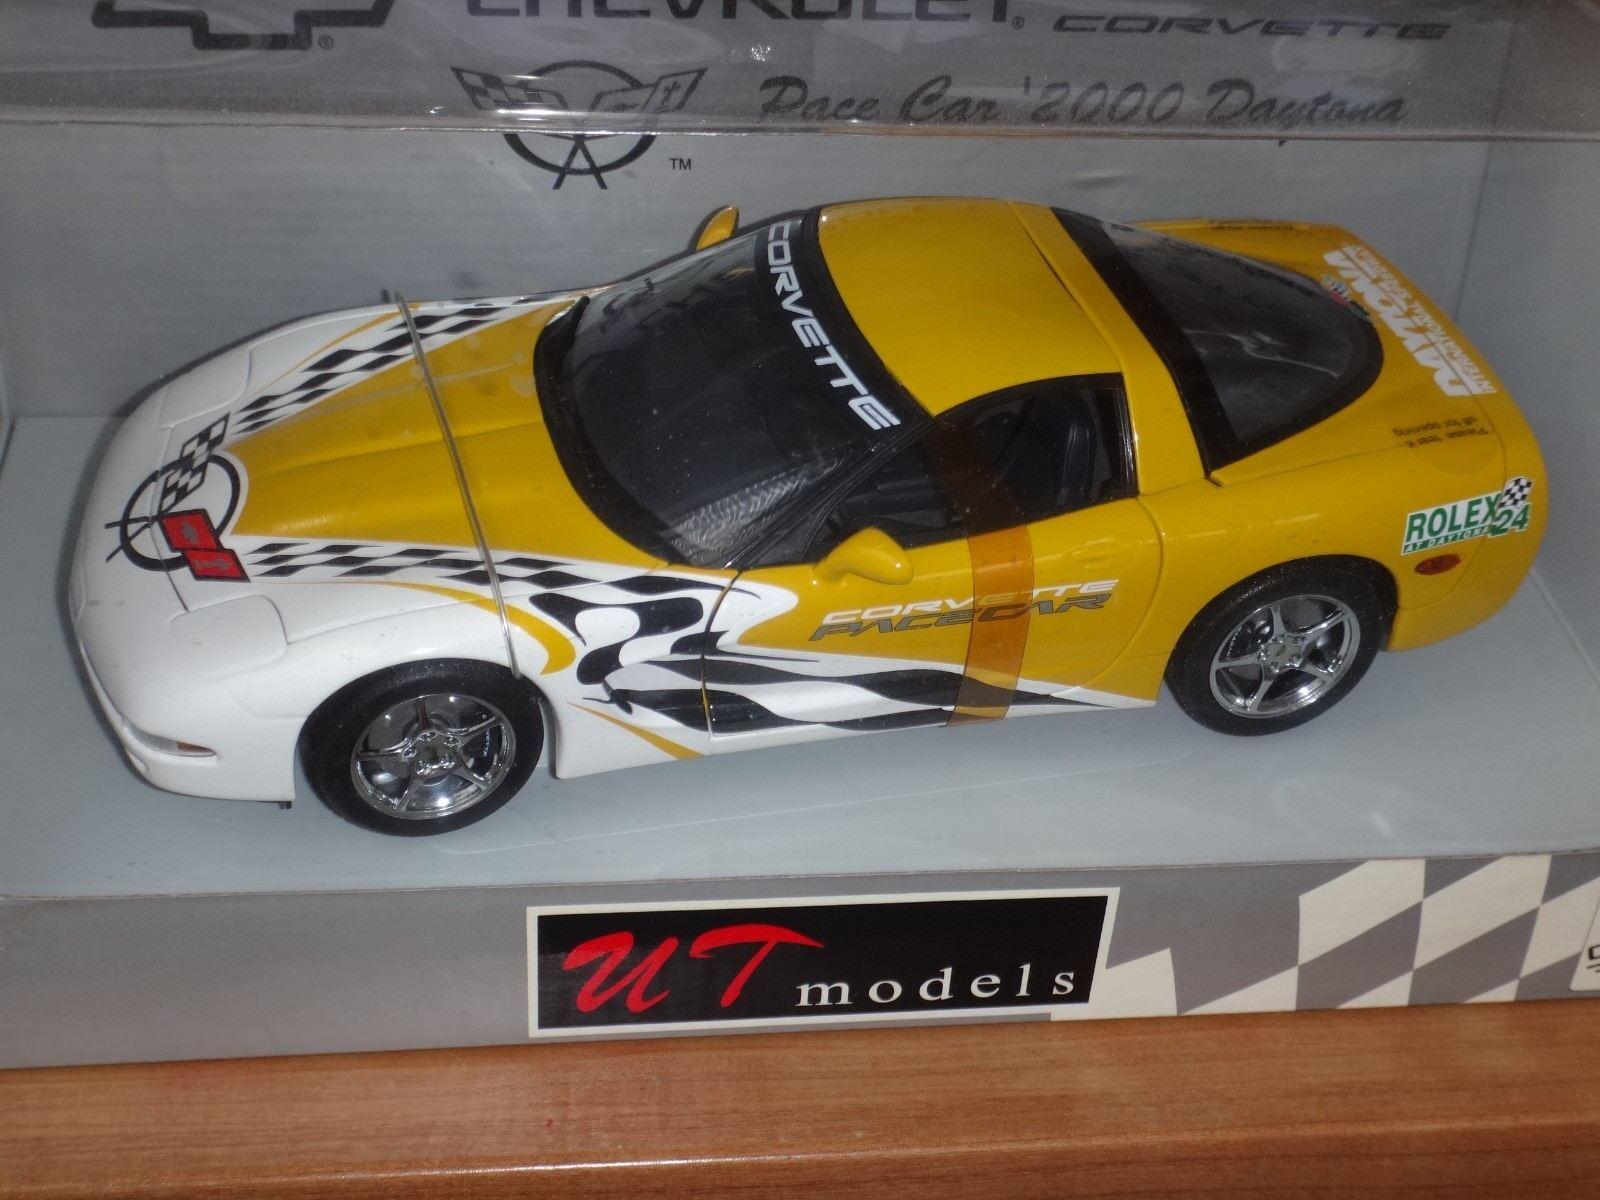 Corvette Pace Car Car Car Daytona 2000 UT Models 1/18 Collector Sold out ! | Moins Cher  78465c